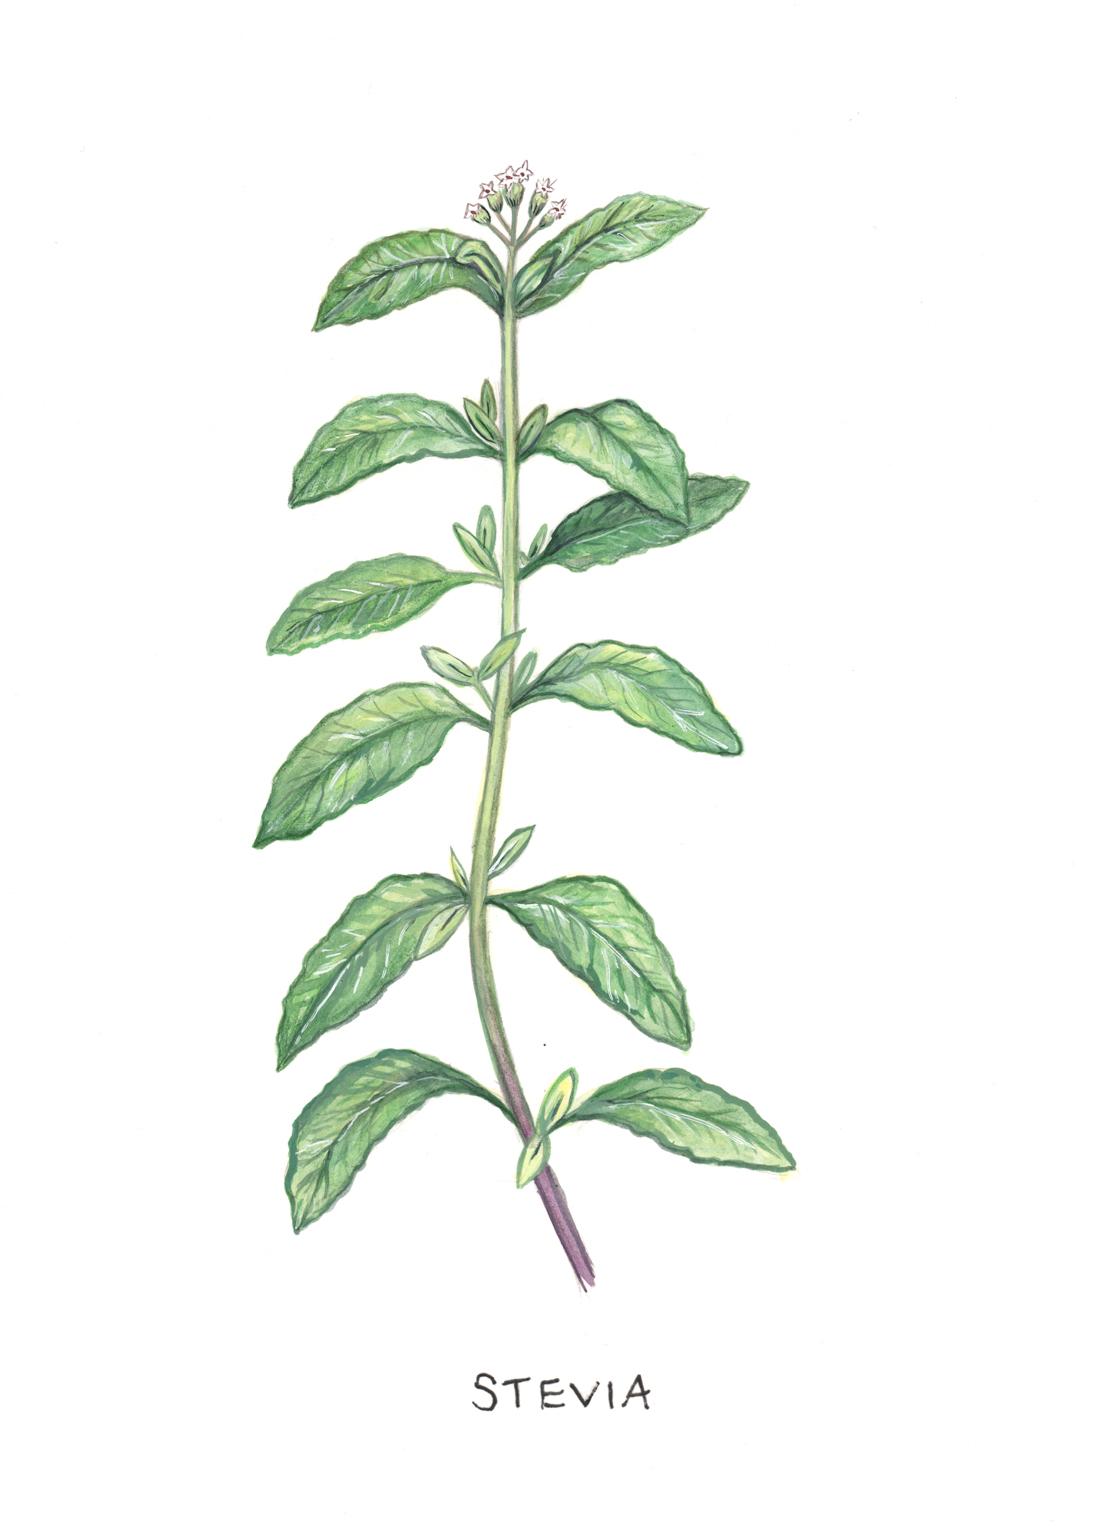 Stevia Botanical Illustration